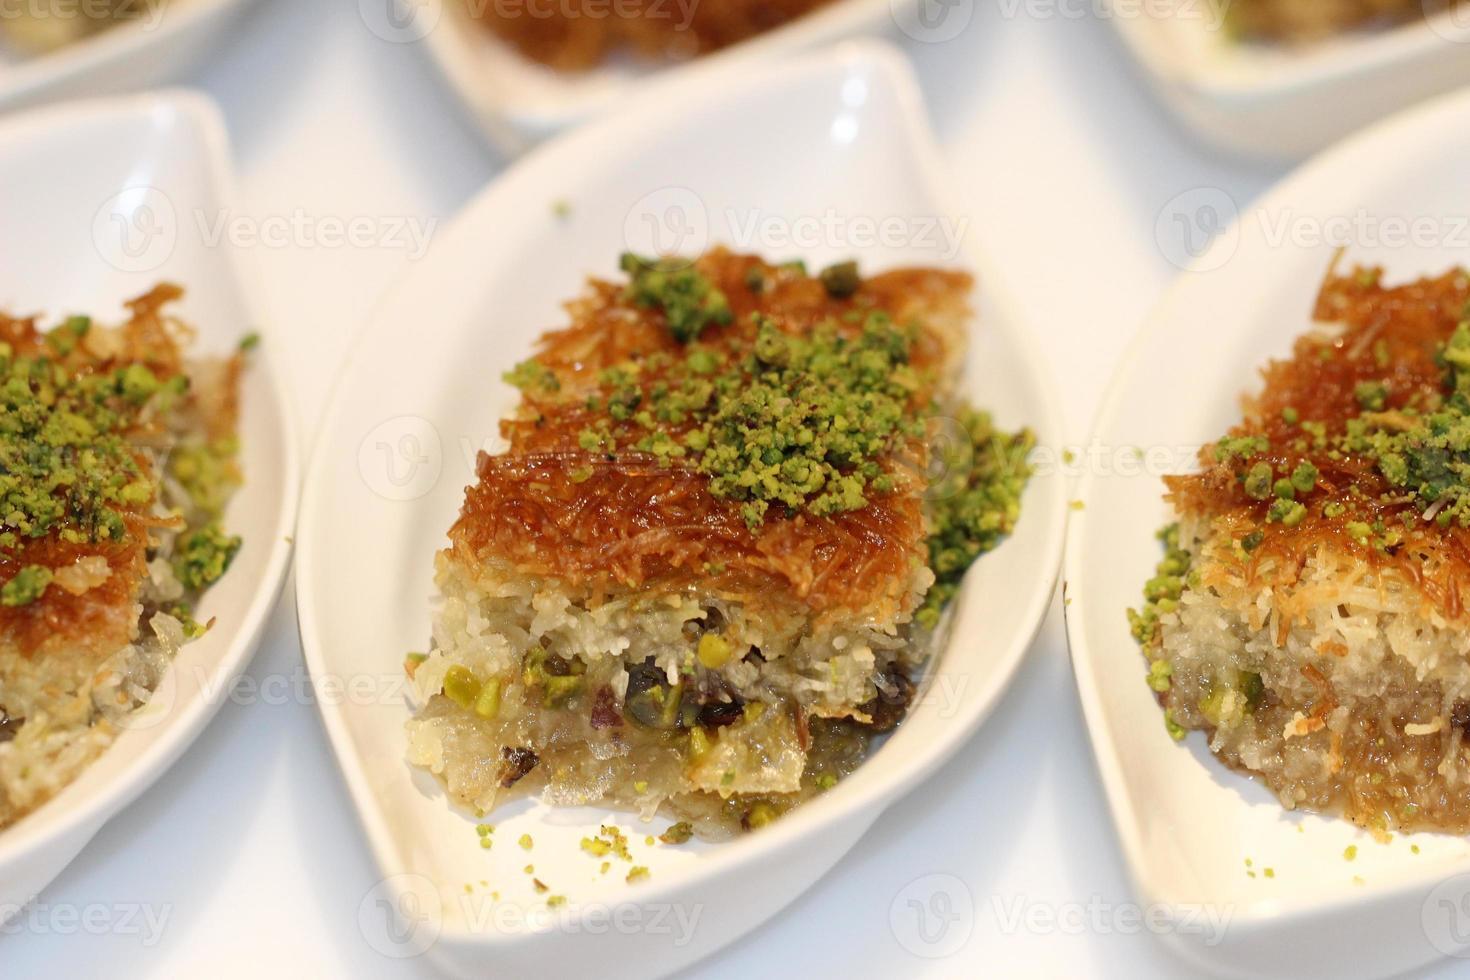 Mellanöstern söt dessert foto